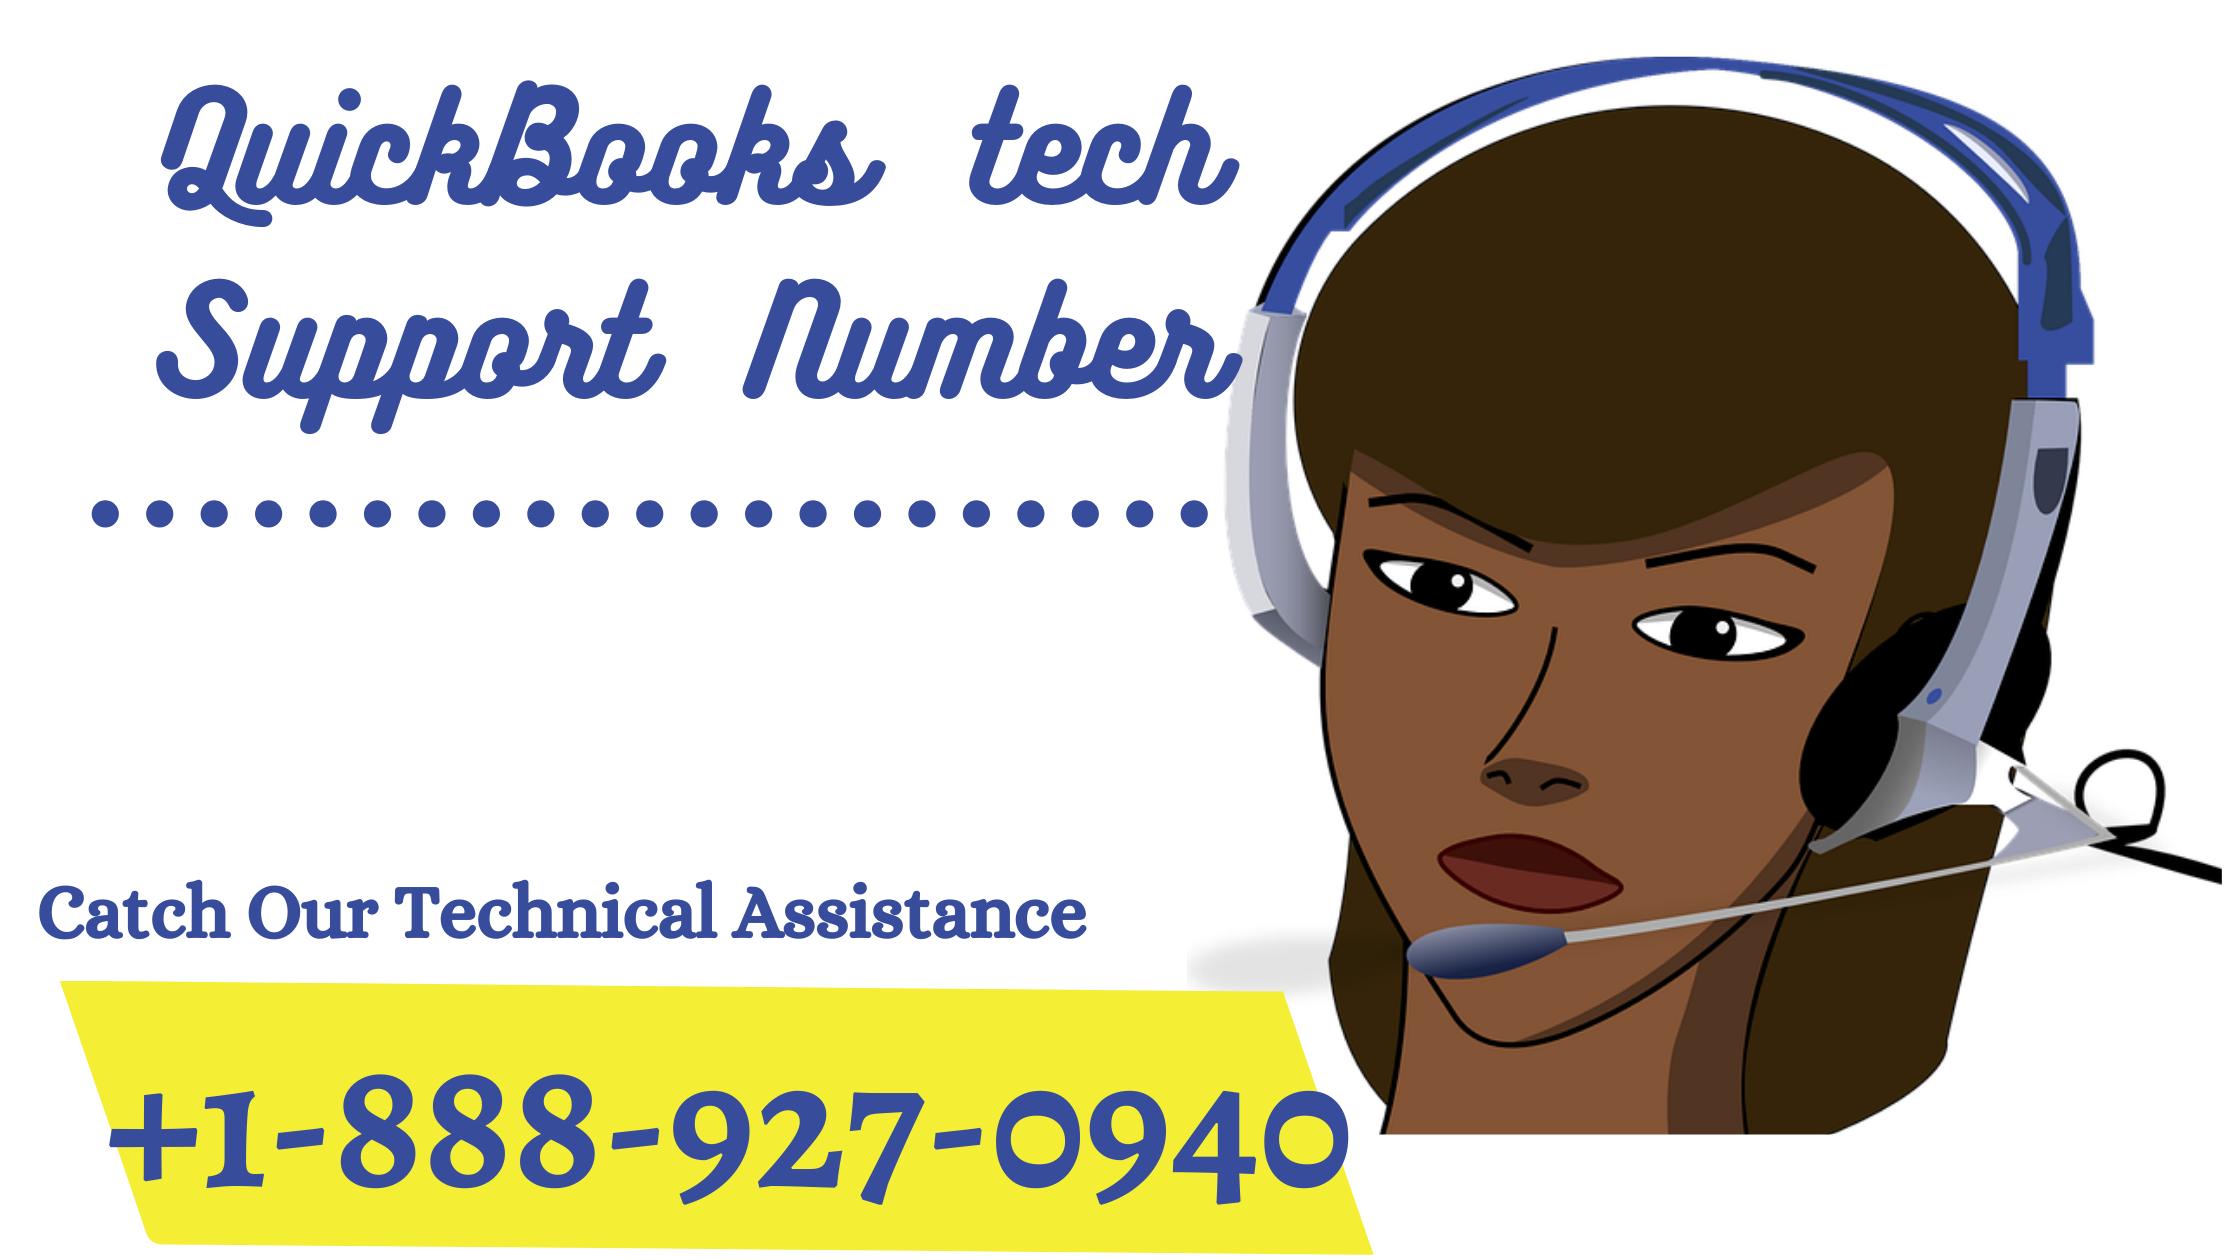 QuickBooks Tech Support Phone Number +1-888-927-0940, Latest News Adda